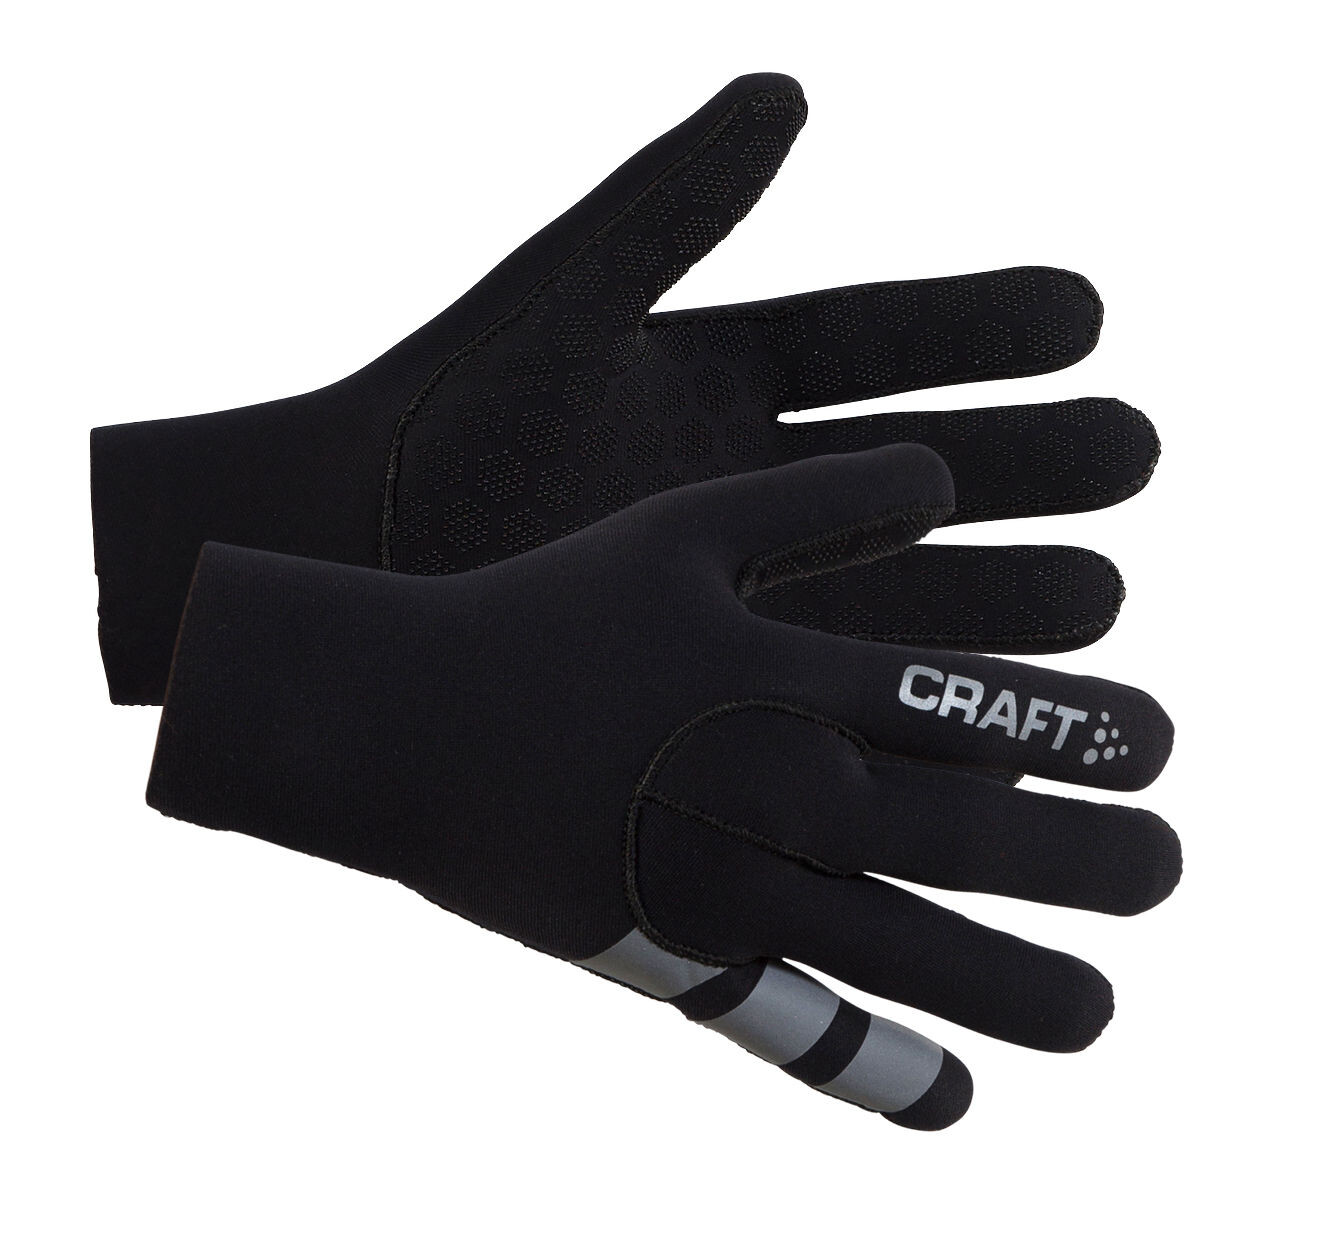 Craft Neoprene 2.0 Cykelhandsker, black | Gloves